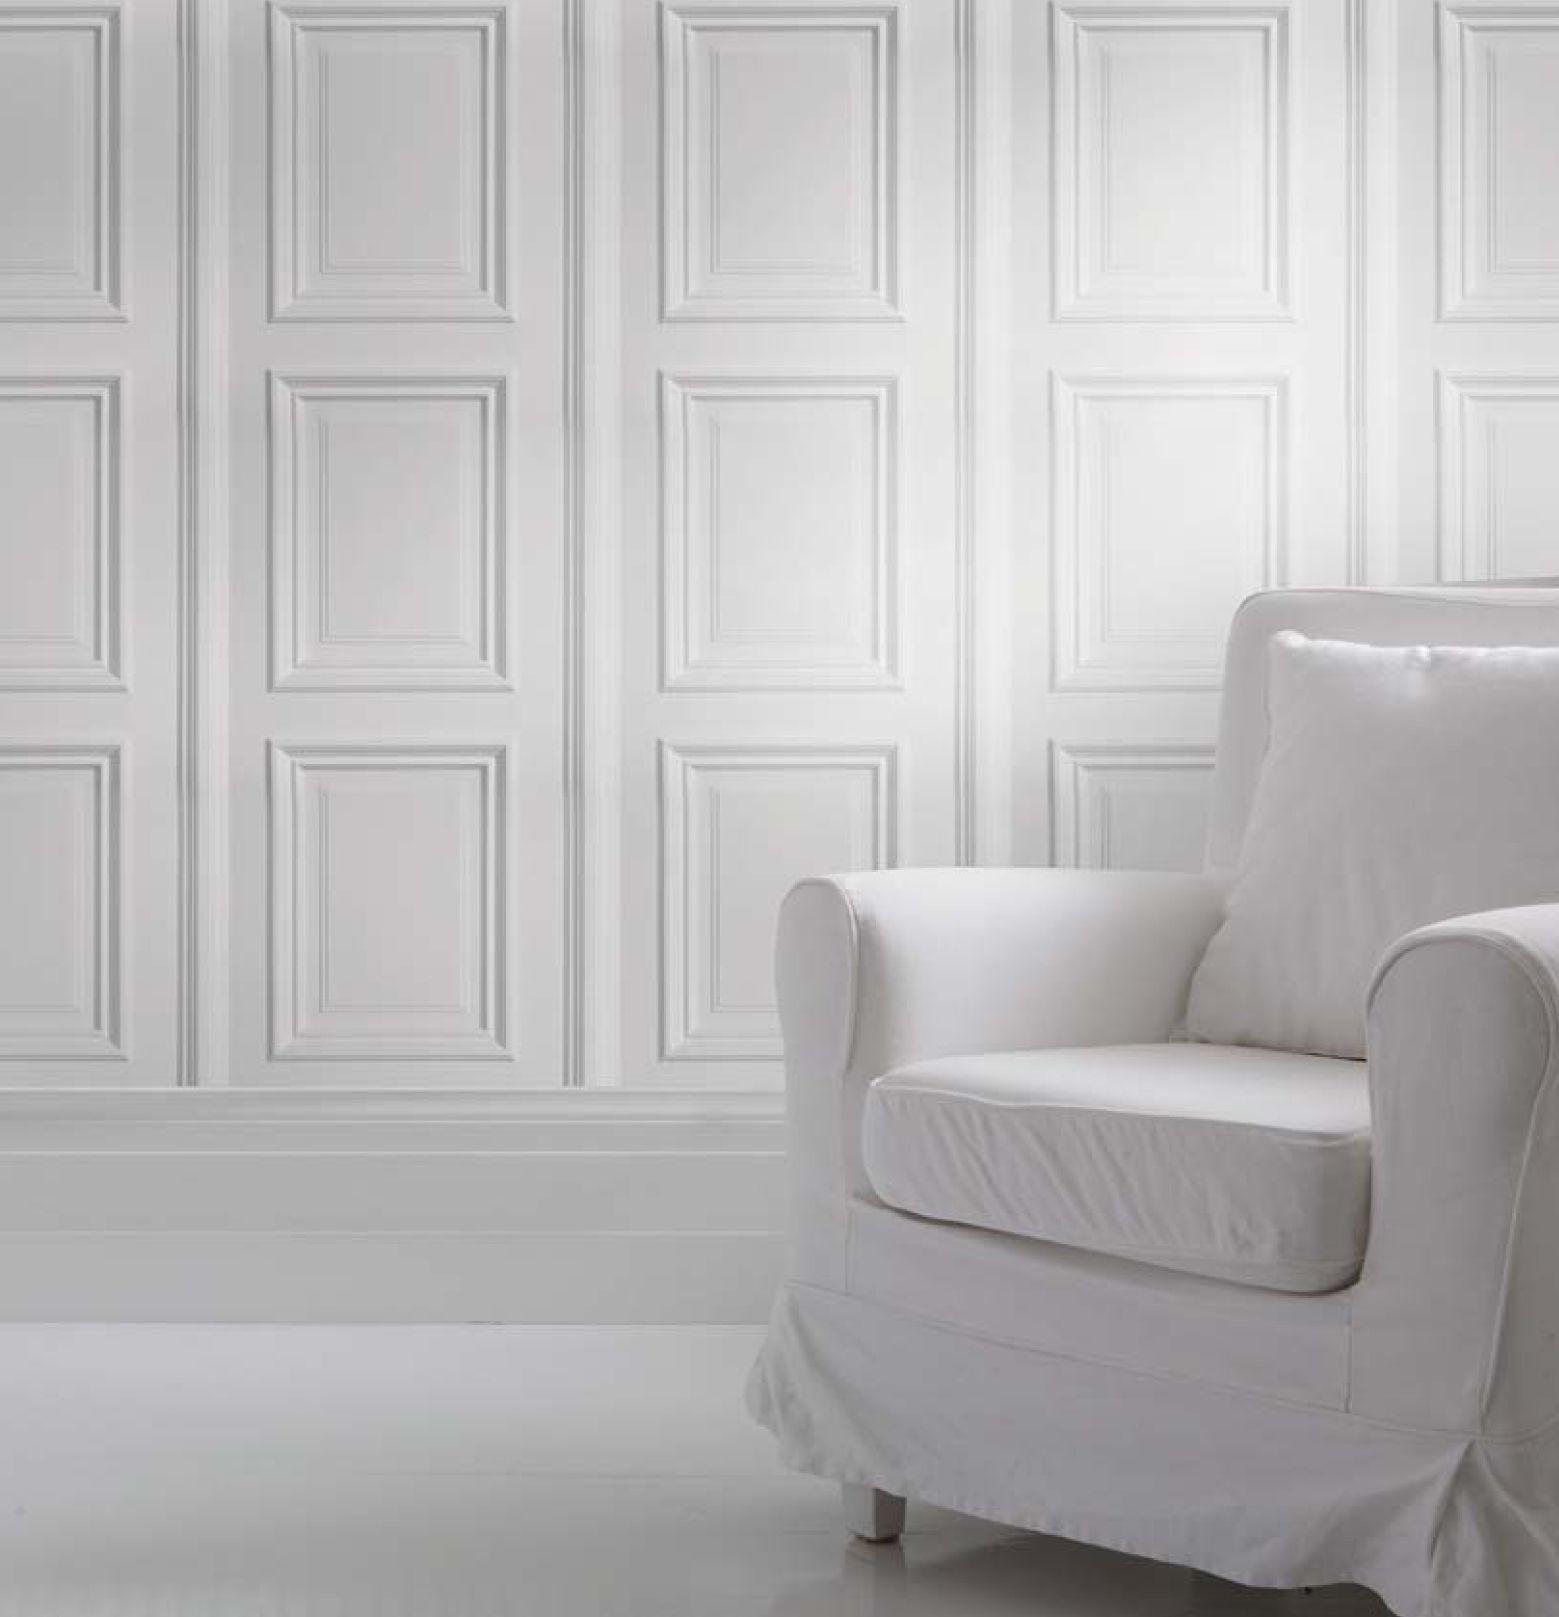 Wallpaper Panelling White Paneling Home White Walls